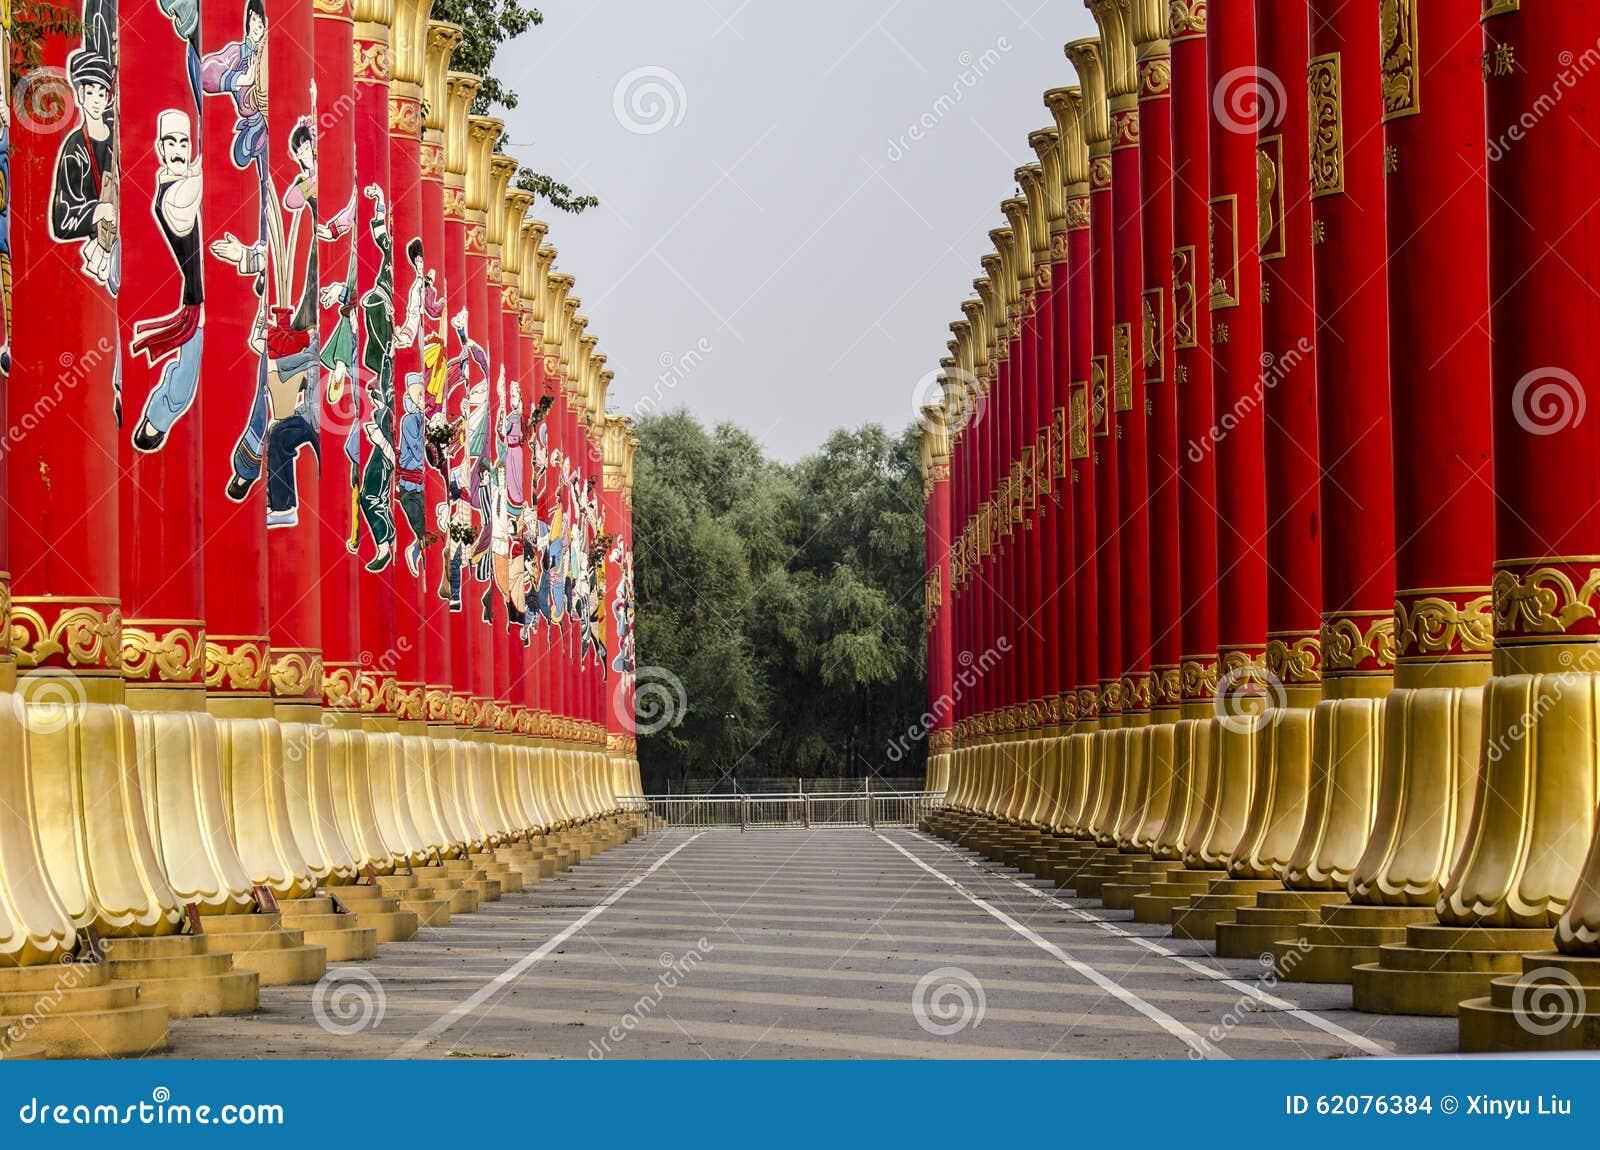 56 Red Pillars in Beijing of China